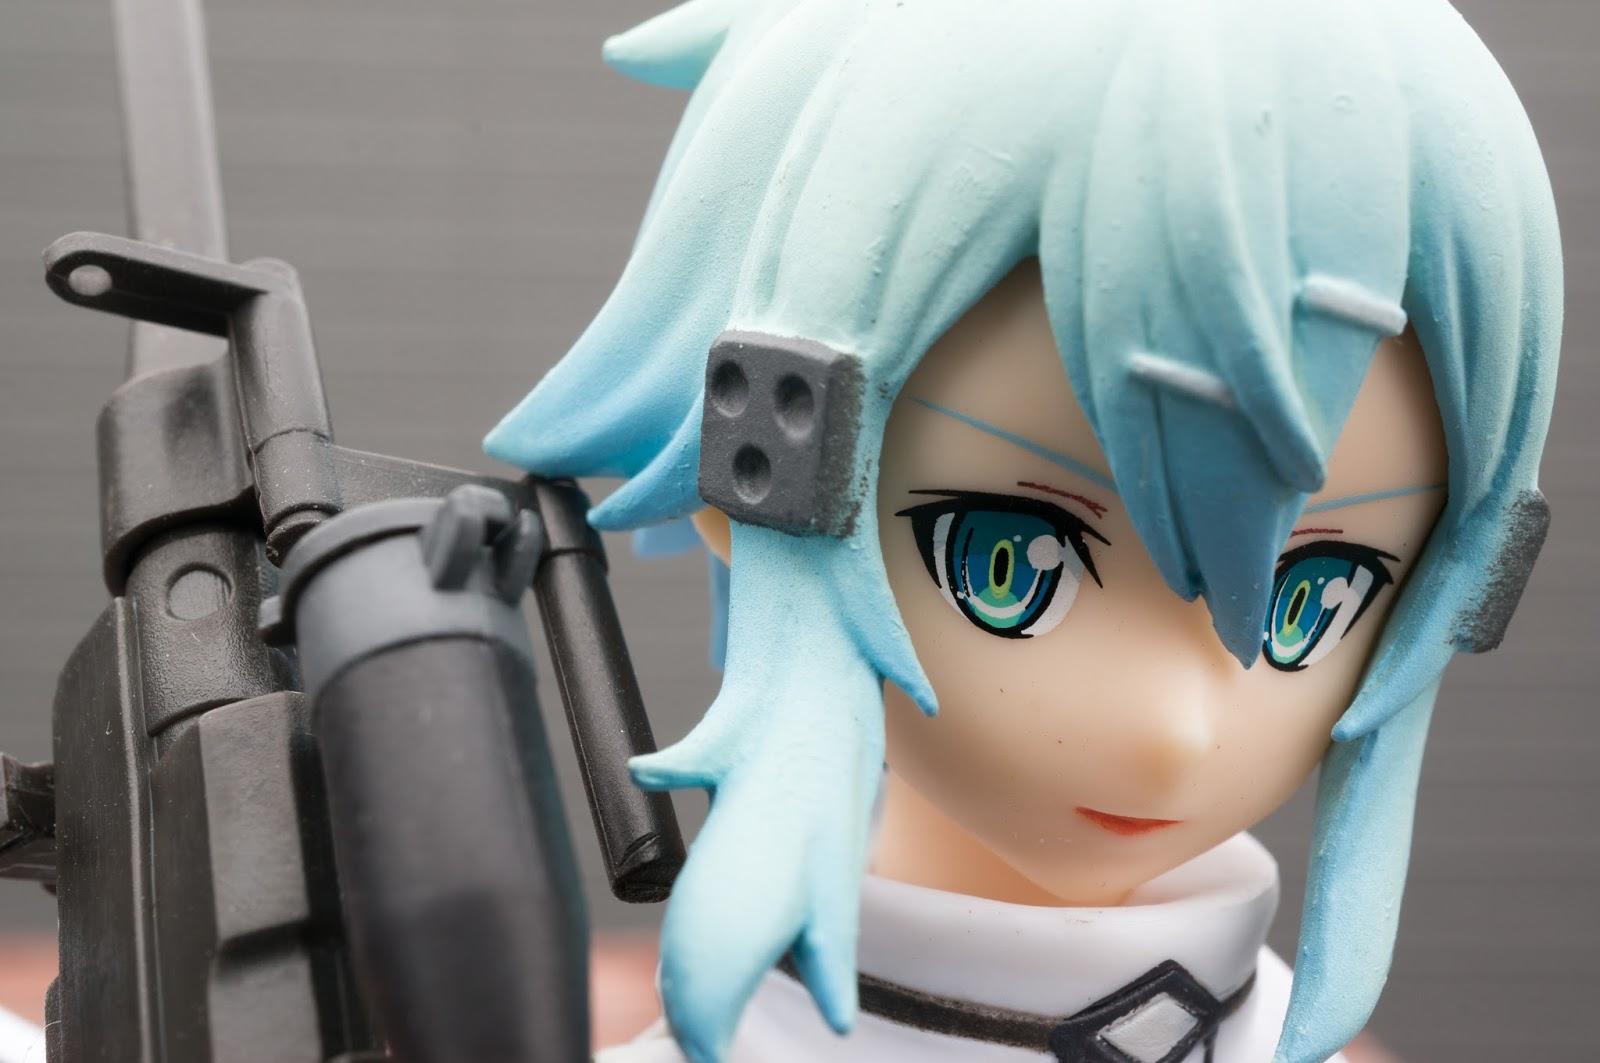 http://coineater.blogspot.jp/2014/11/swordartonline2-SQ-sinon-figure-hecate2-banpresto.html